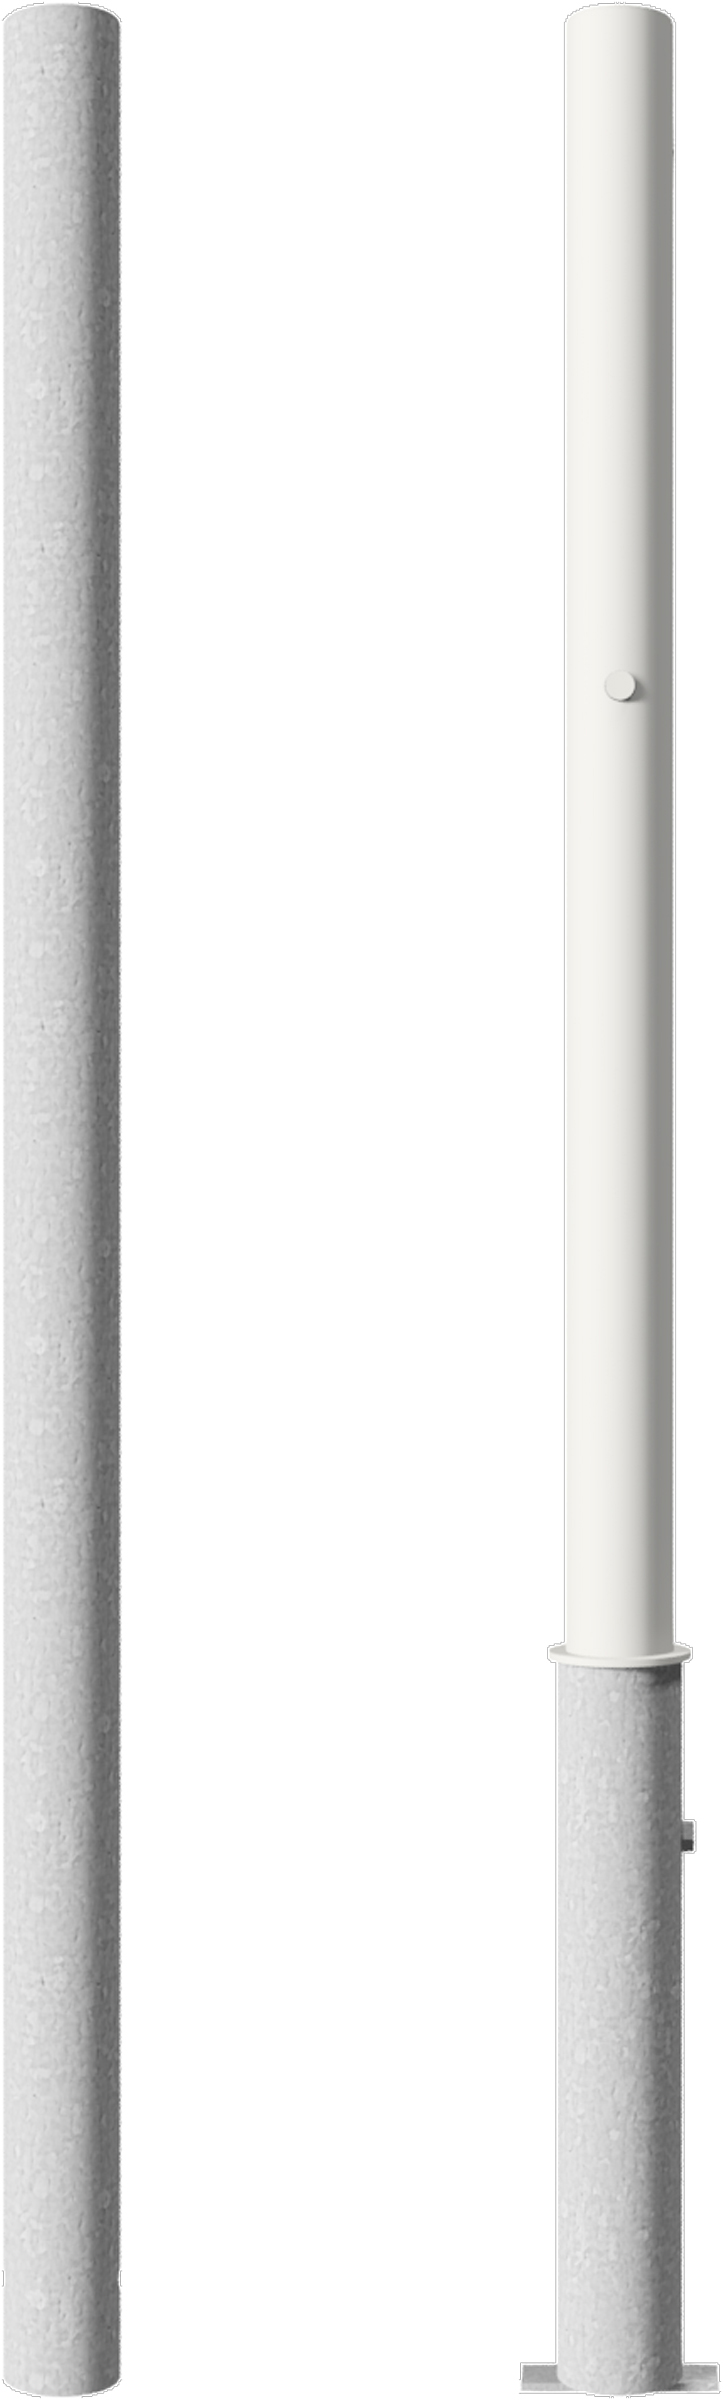 Schake Edelstahlpfosten Ø 60 mm